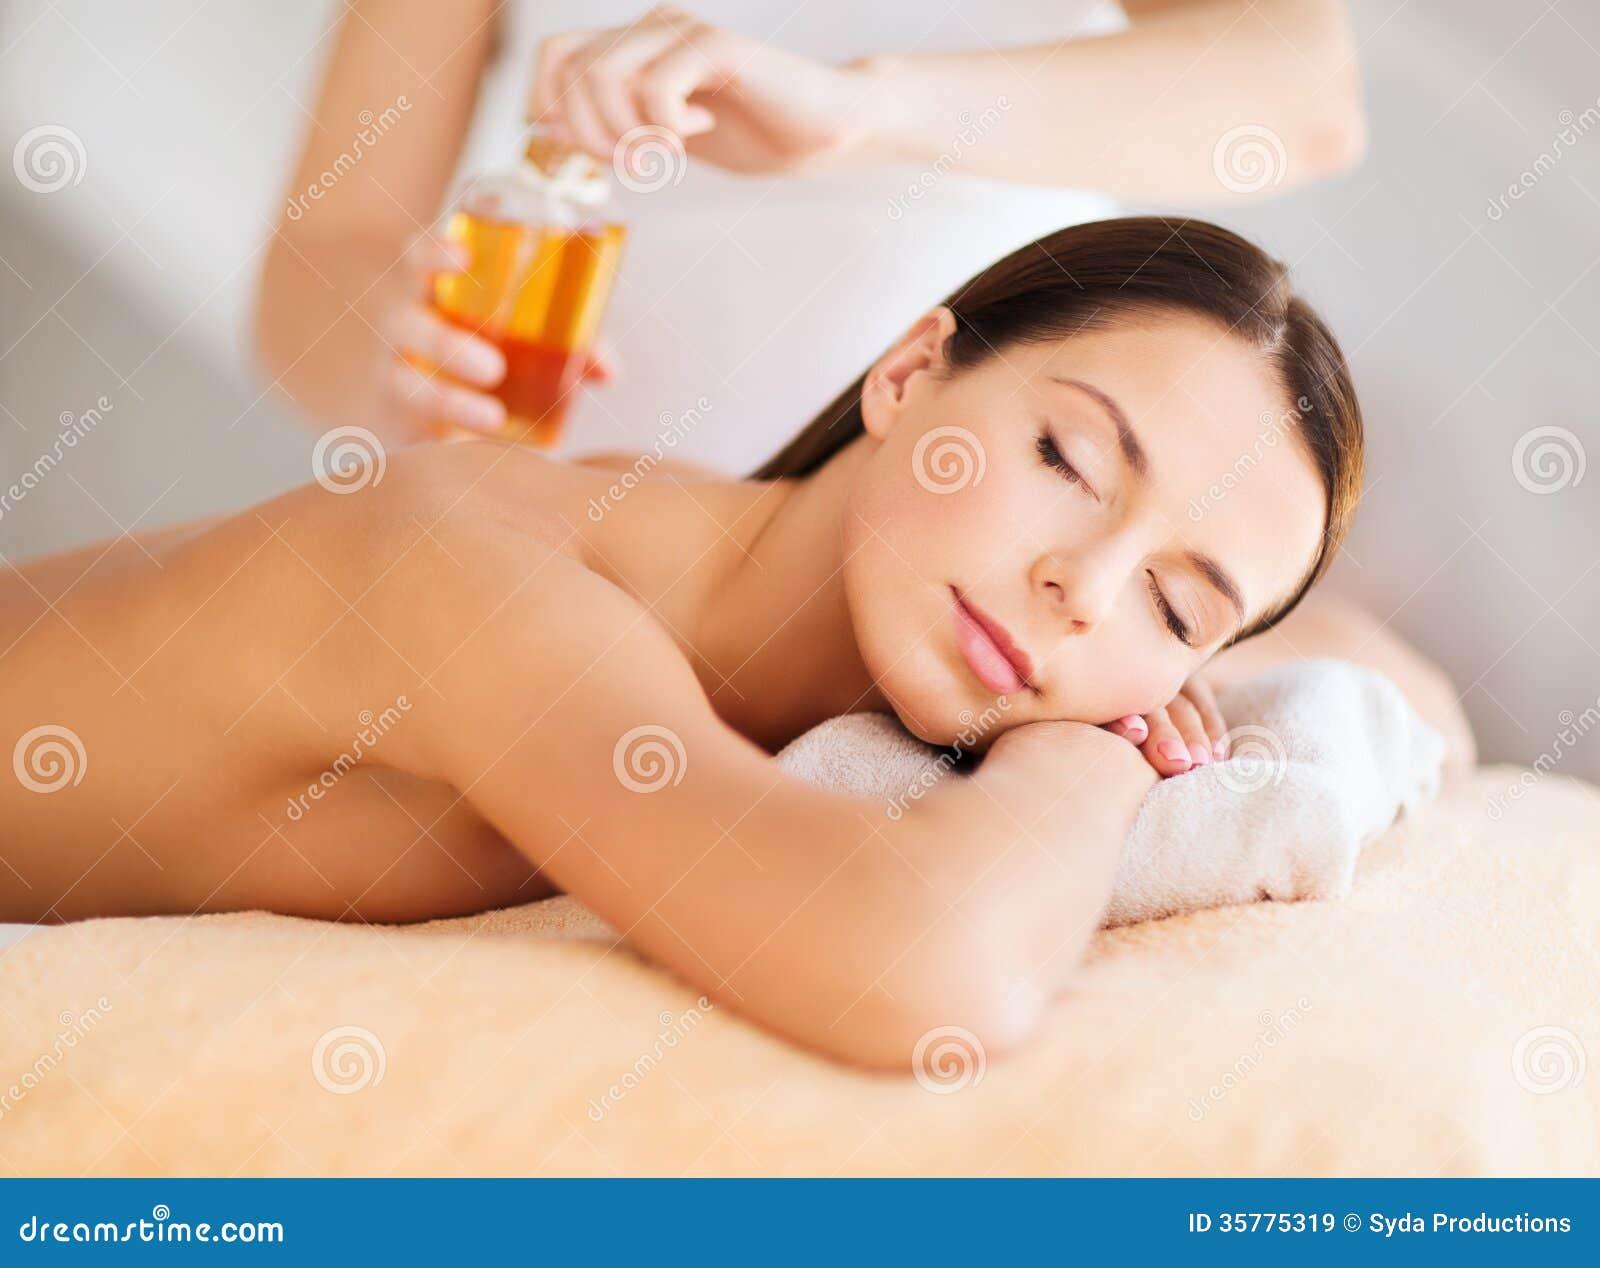 Teen Health Spa Women 9